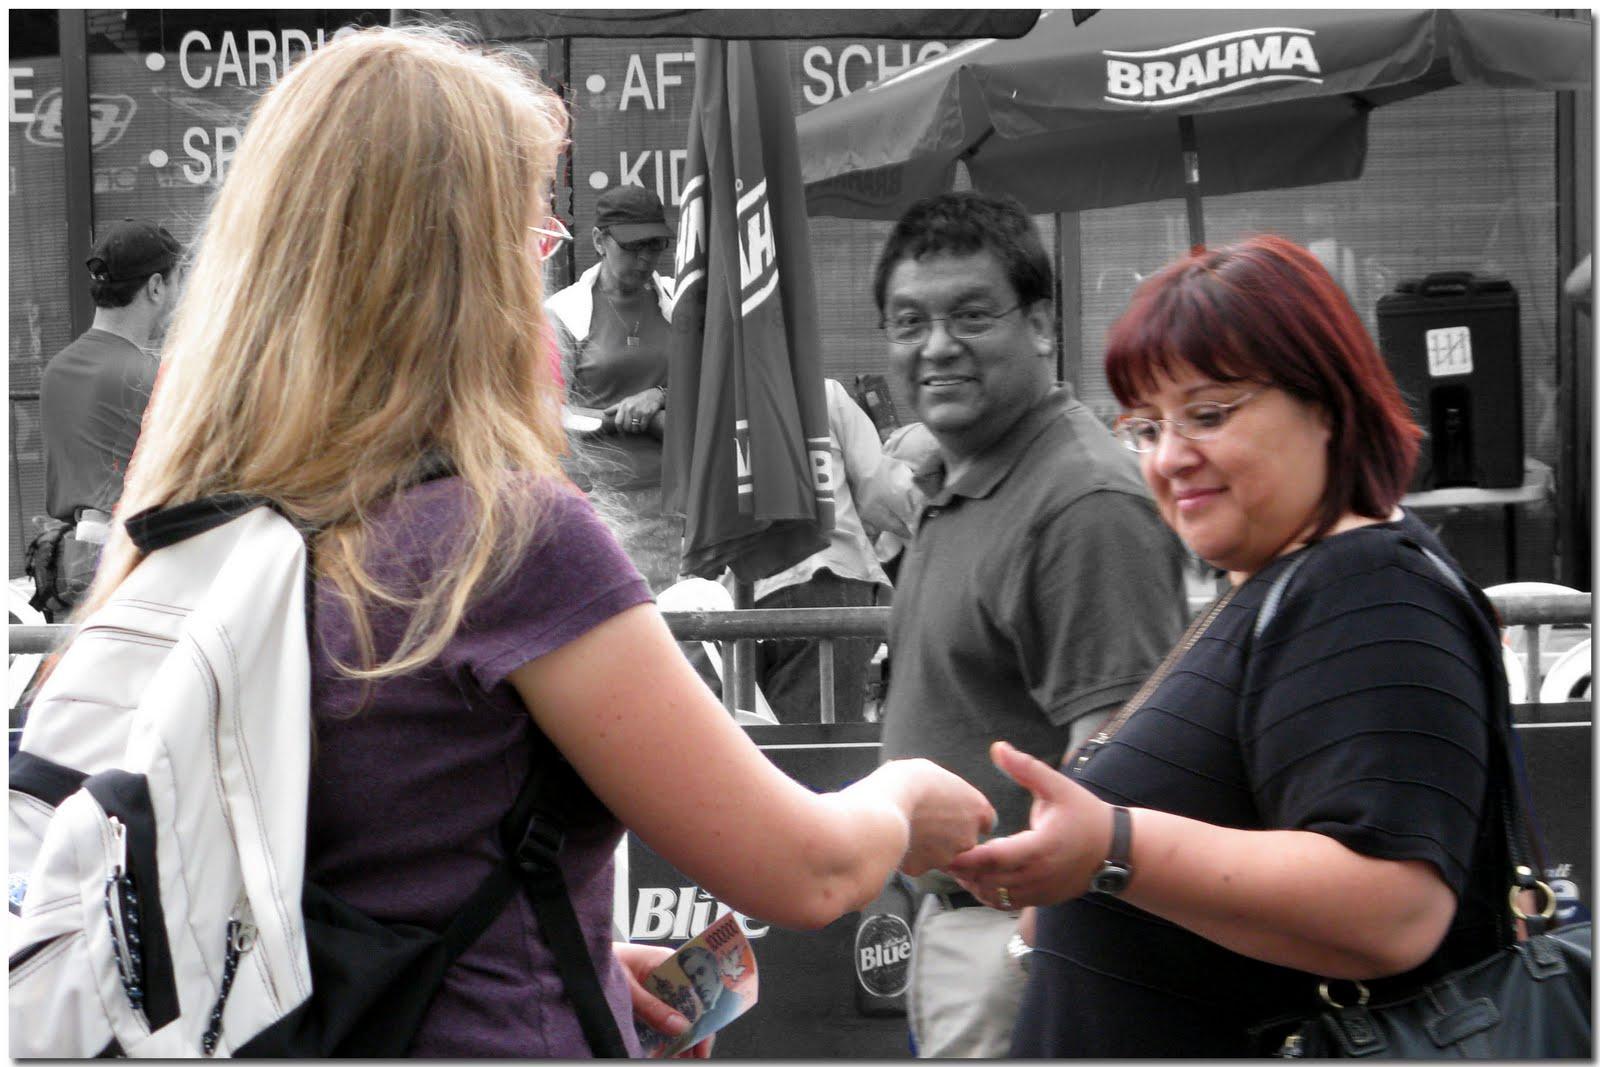 Image of woman handing out Gospel Tract, via The Word Street Jorunal